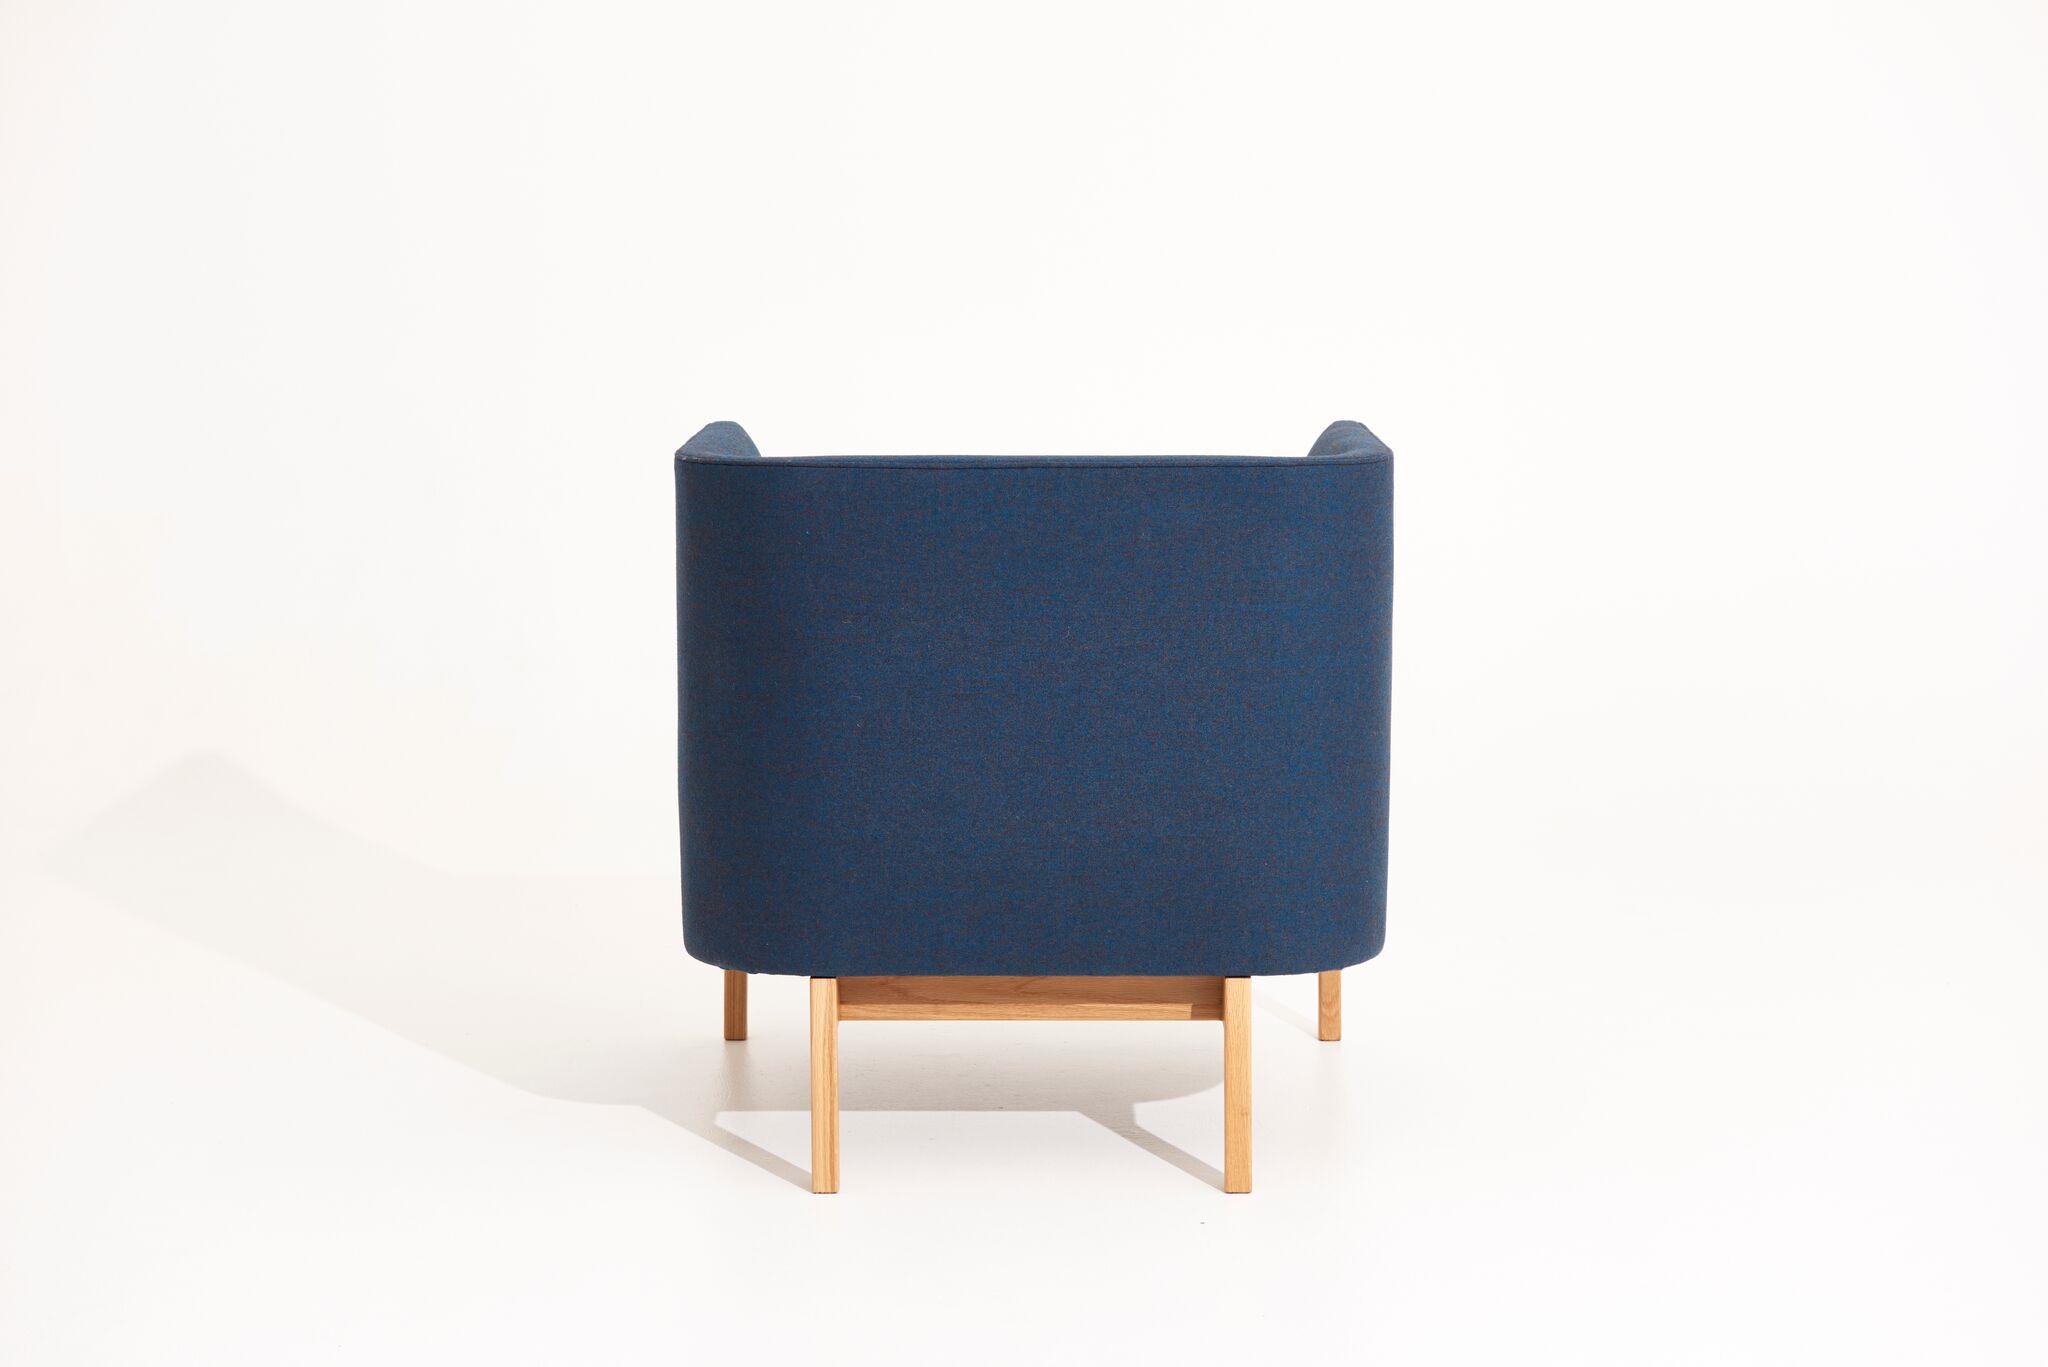 Gallery Of Heir Armchair By Apparentt Local Australian Furniture & Lighting Design Richmond, Melbourne Image 4